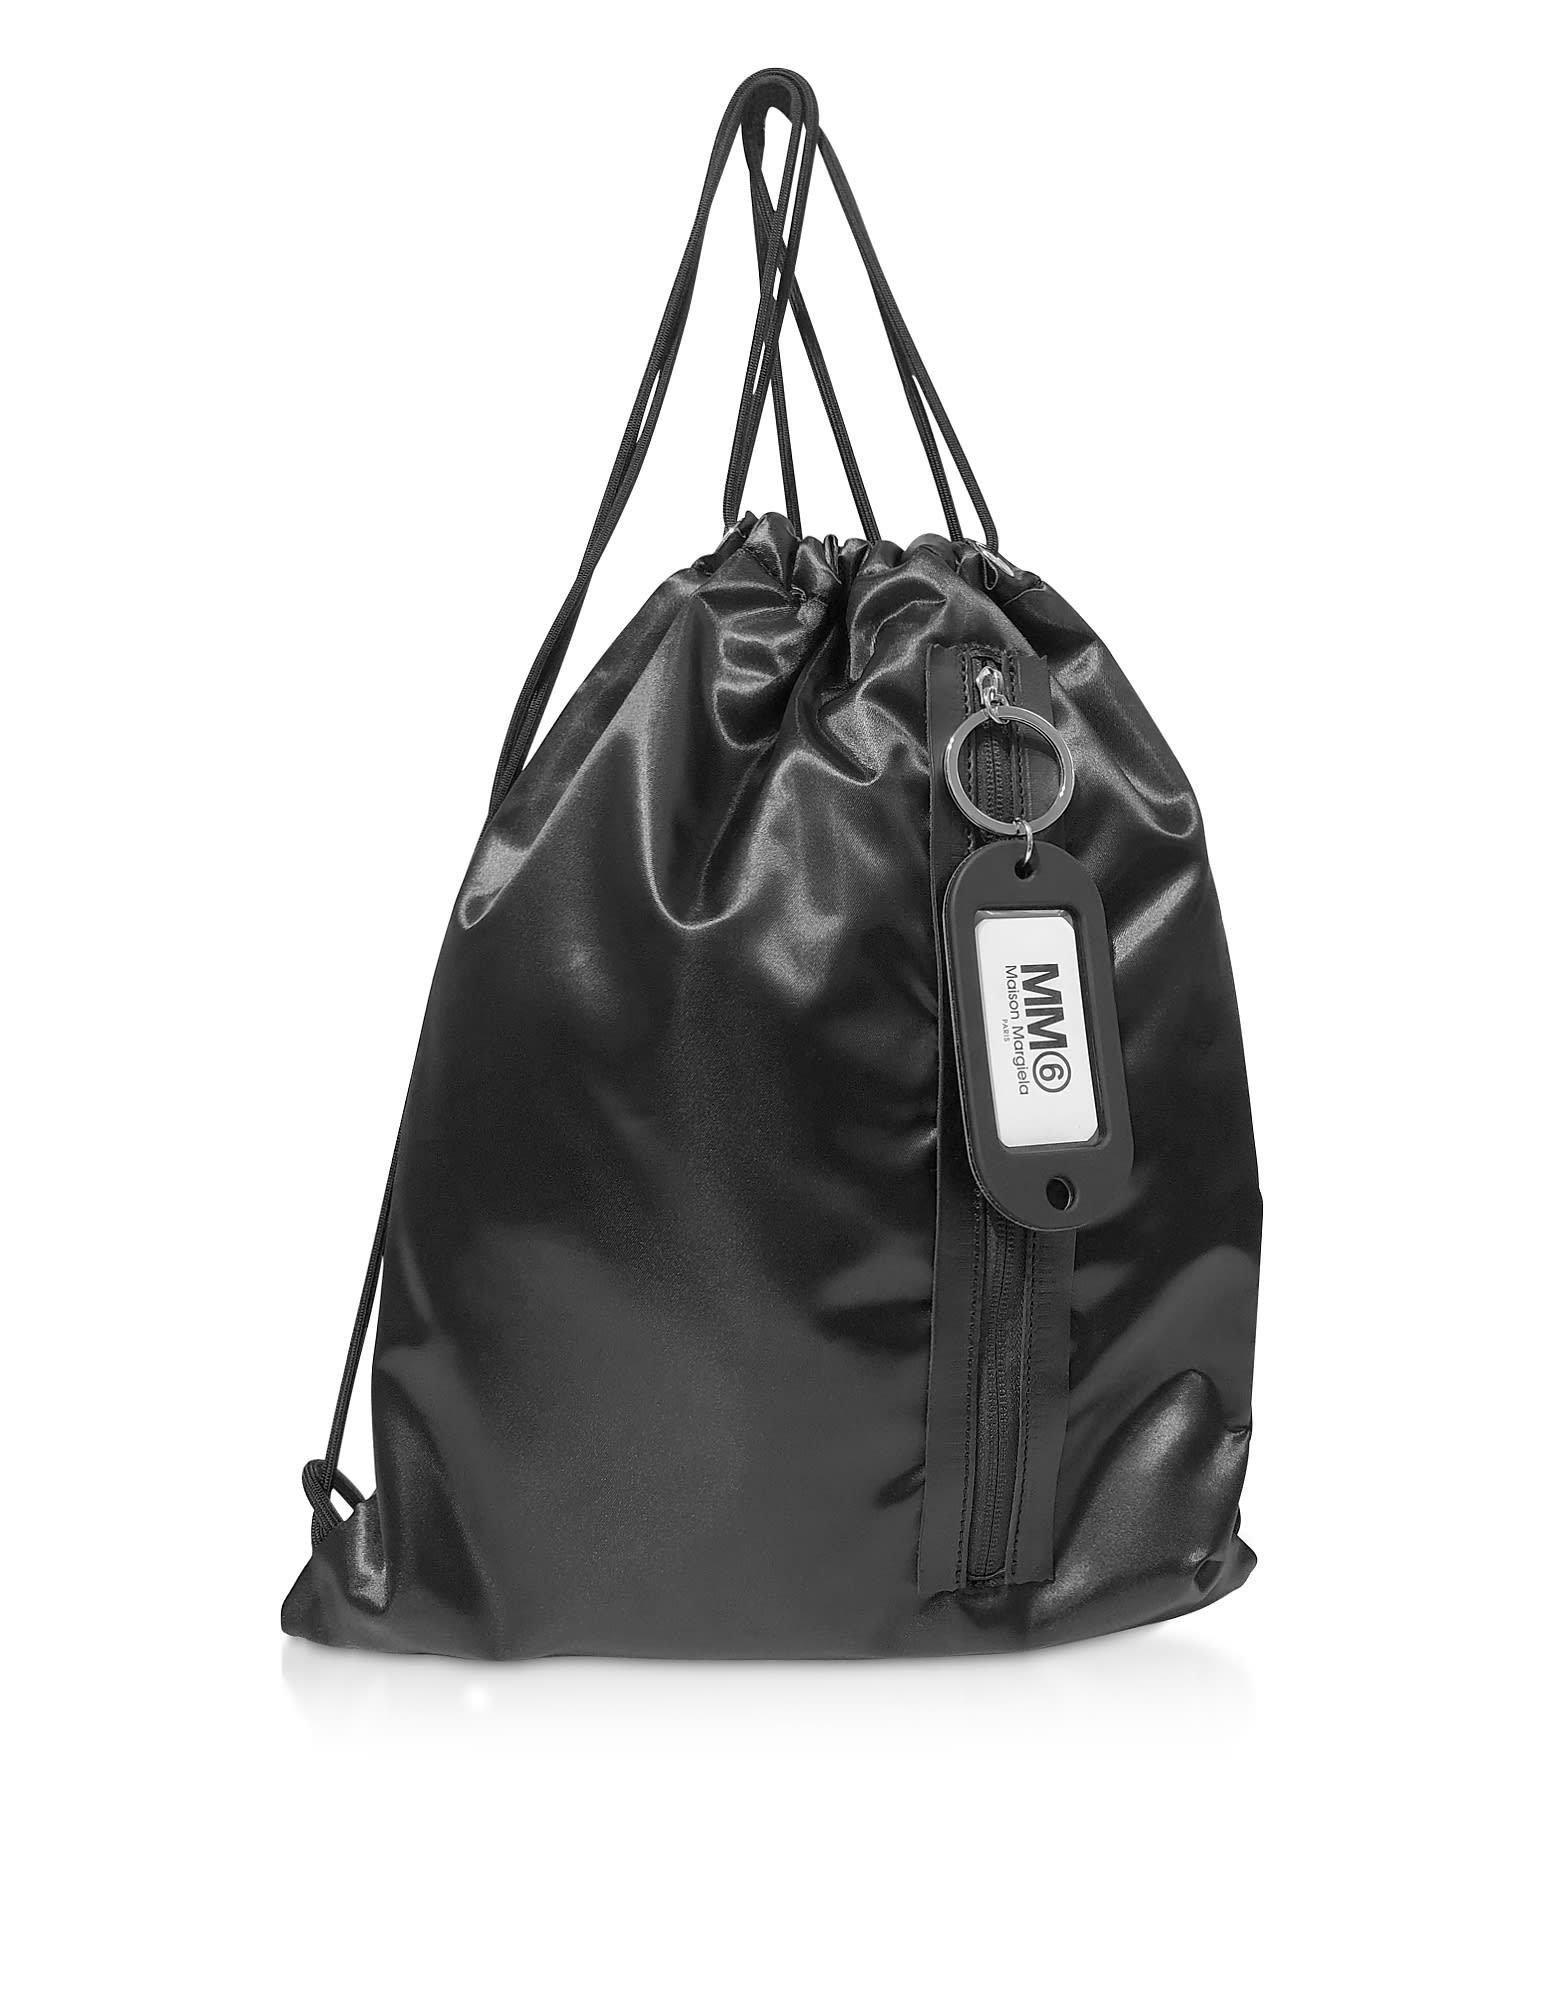 Mm6 Maison Martin Margiela Black Drawstring Nylon Backpack